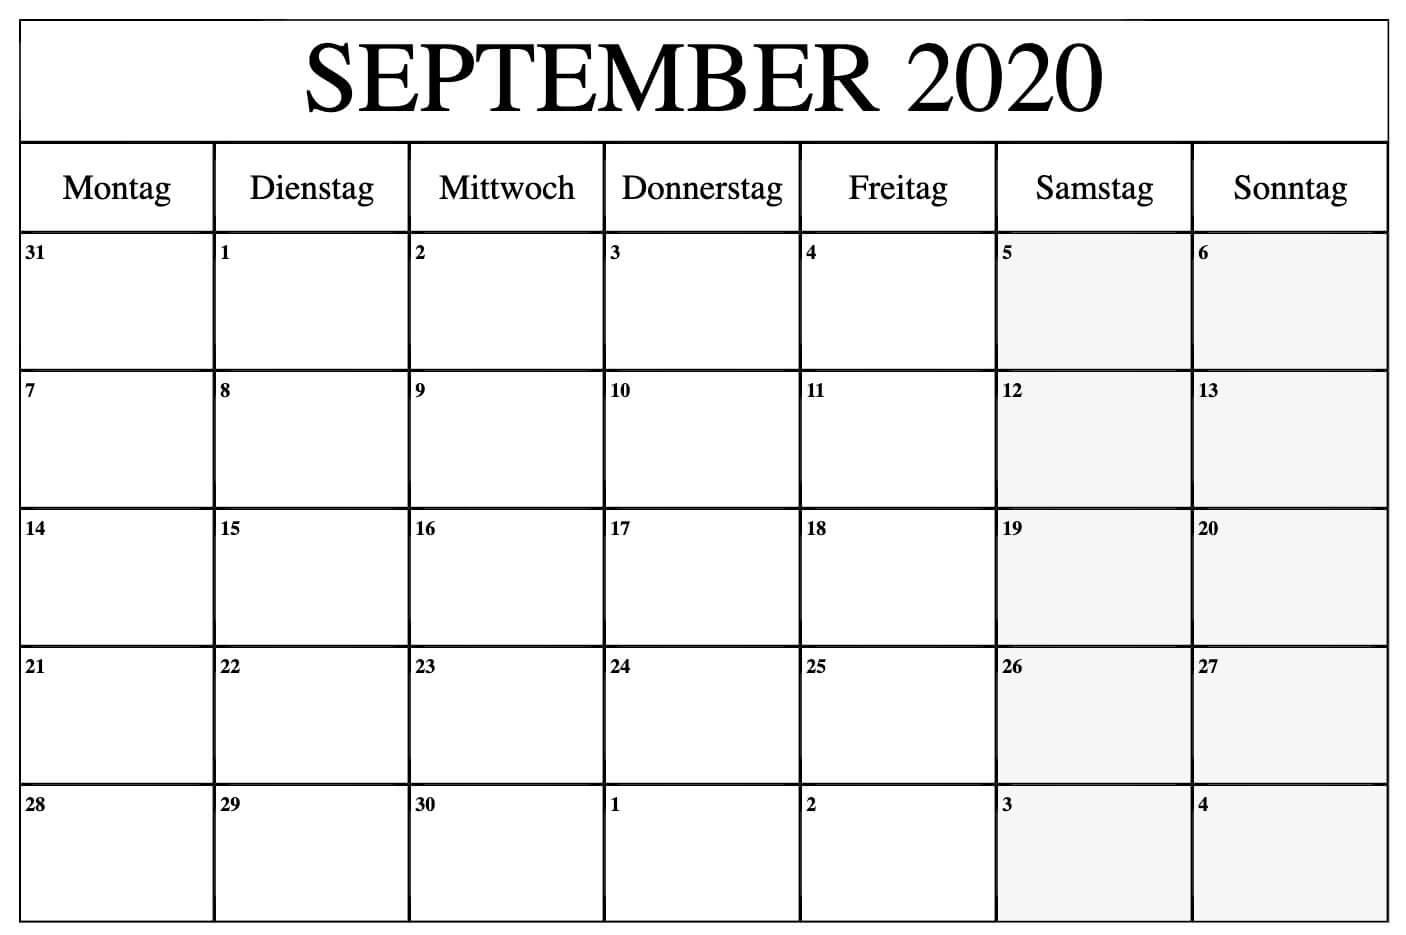 September Kalender 2020 Word - Free Printable 2021 Calendar Templates With Holidays September 2020 To September 2021 Calendar